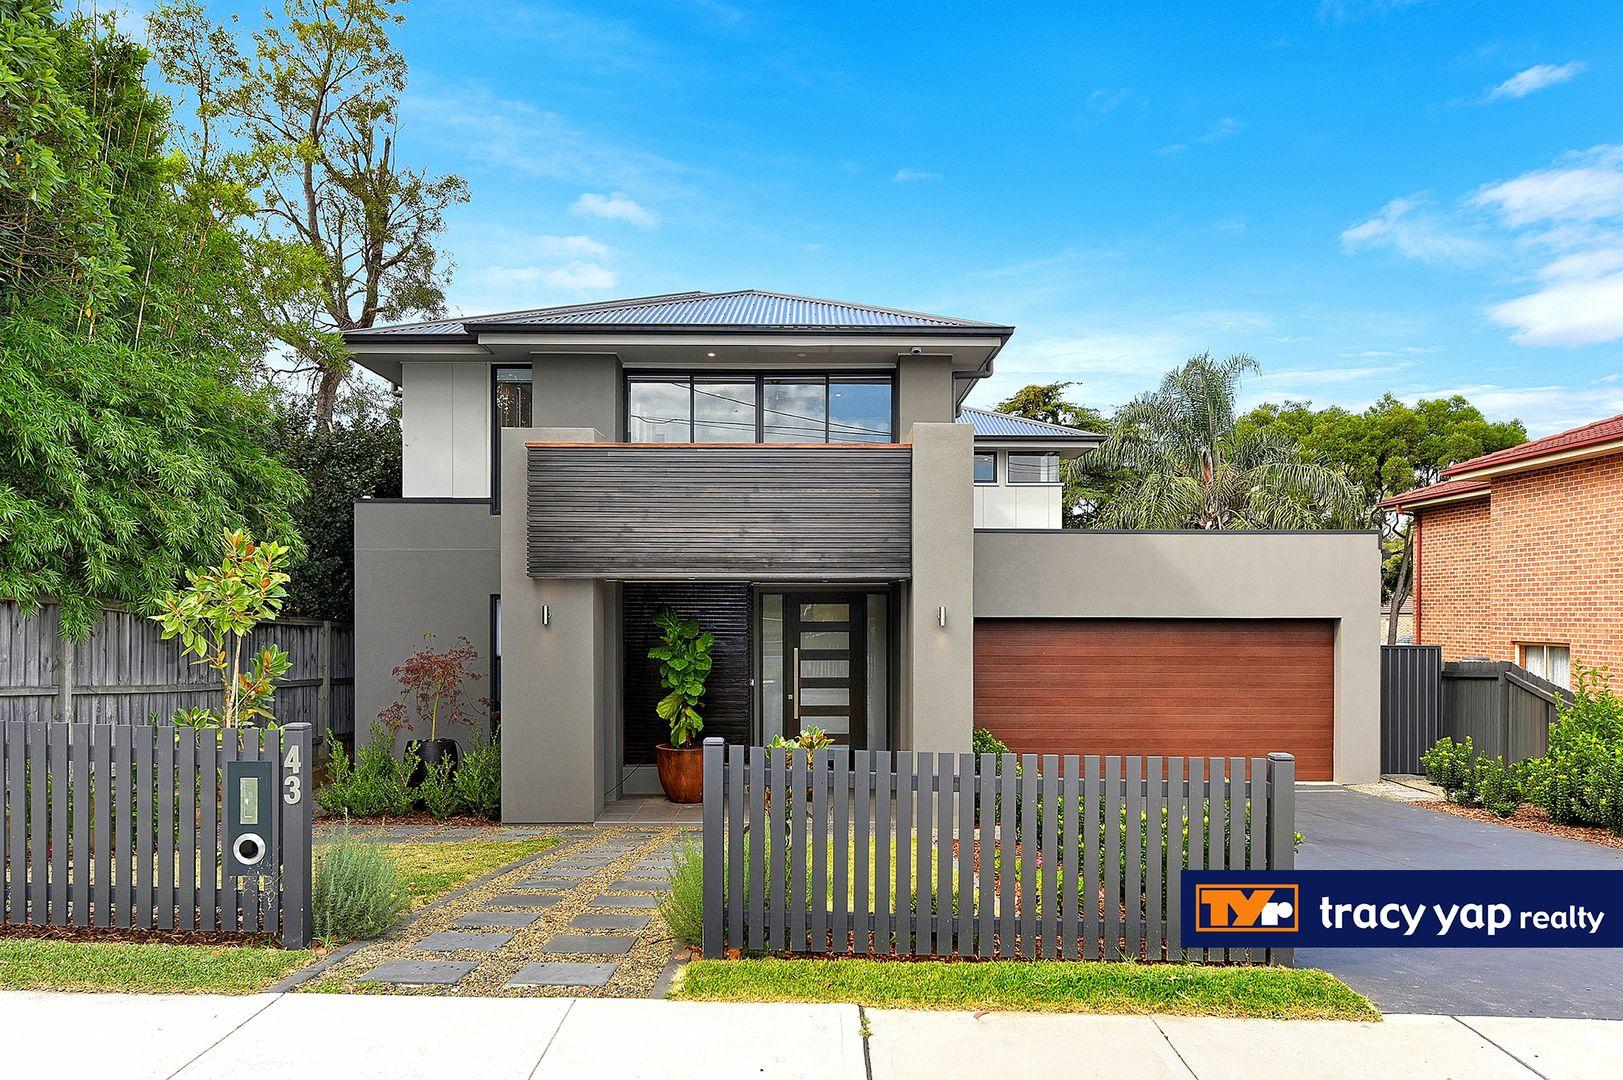 43 Blenheim  Road, North Ryde NSW 2113, Image 0